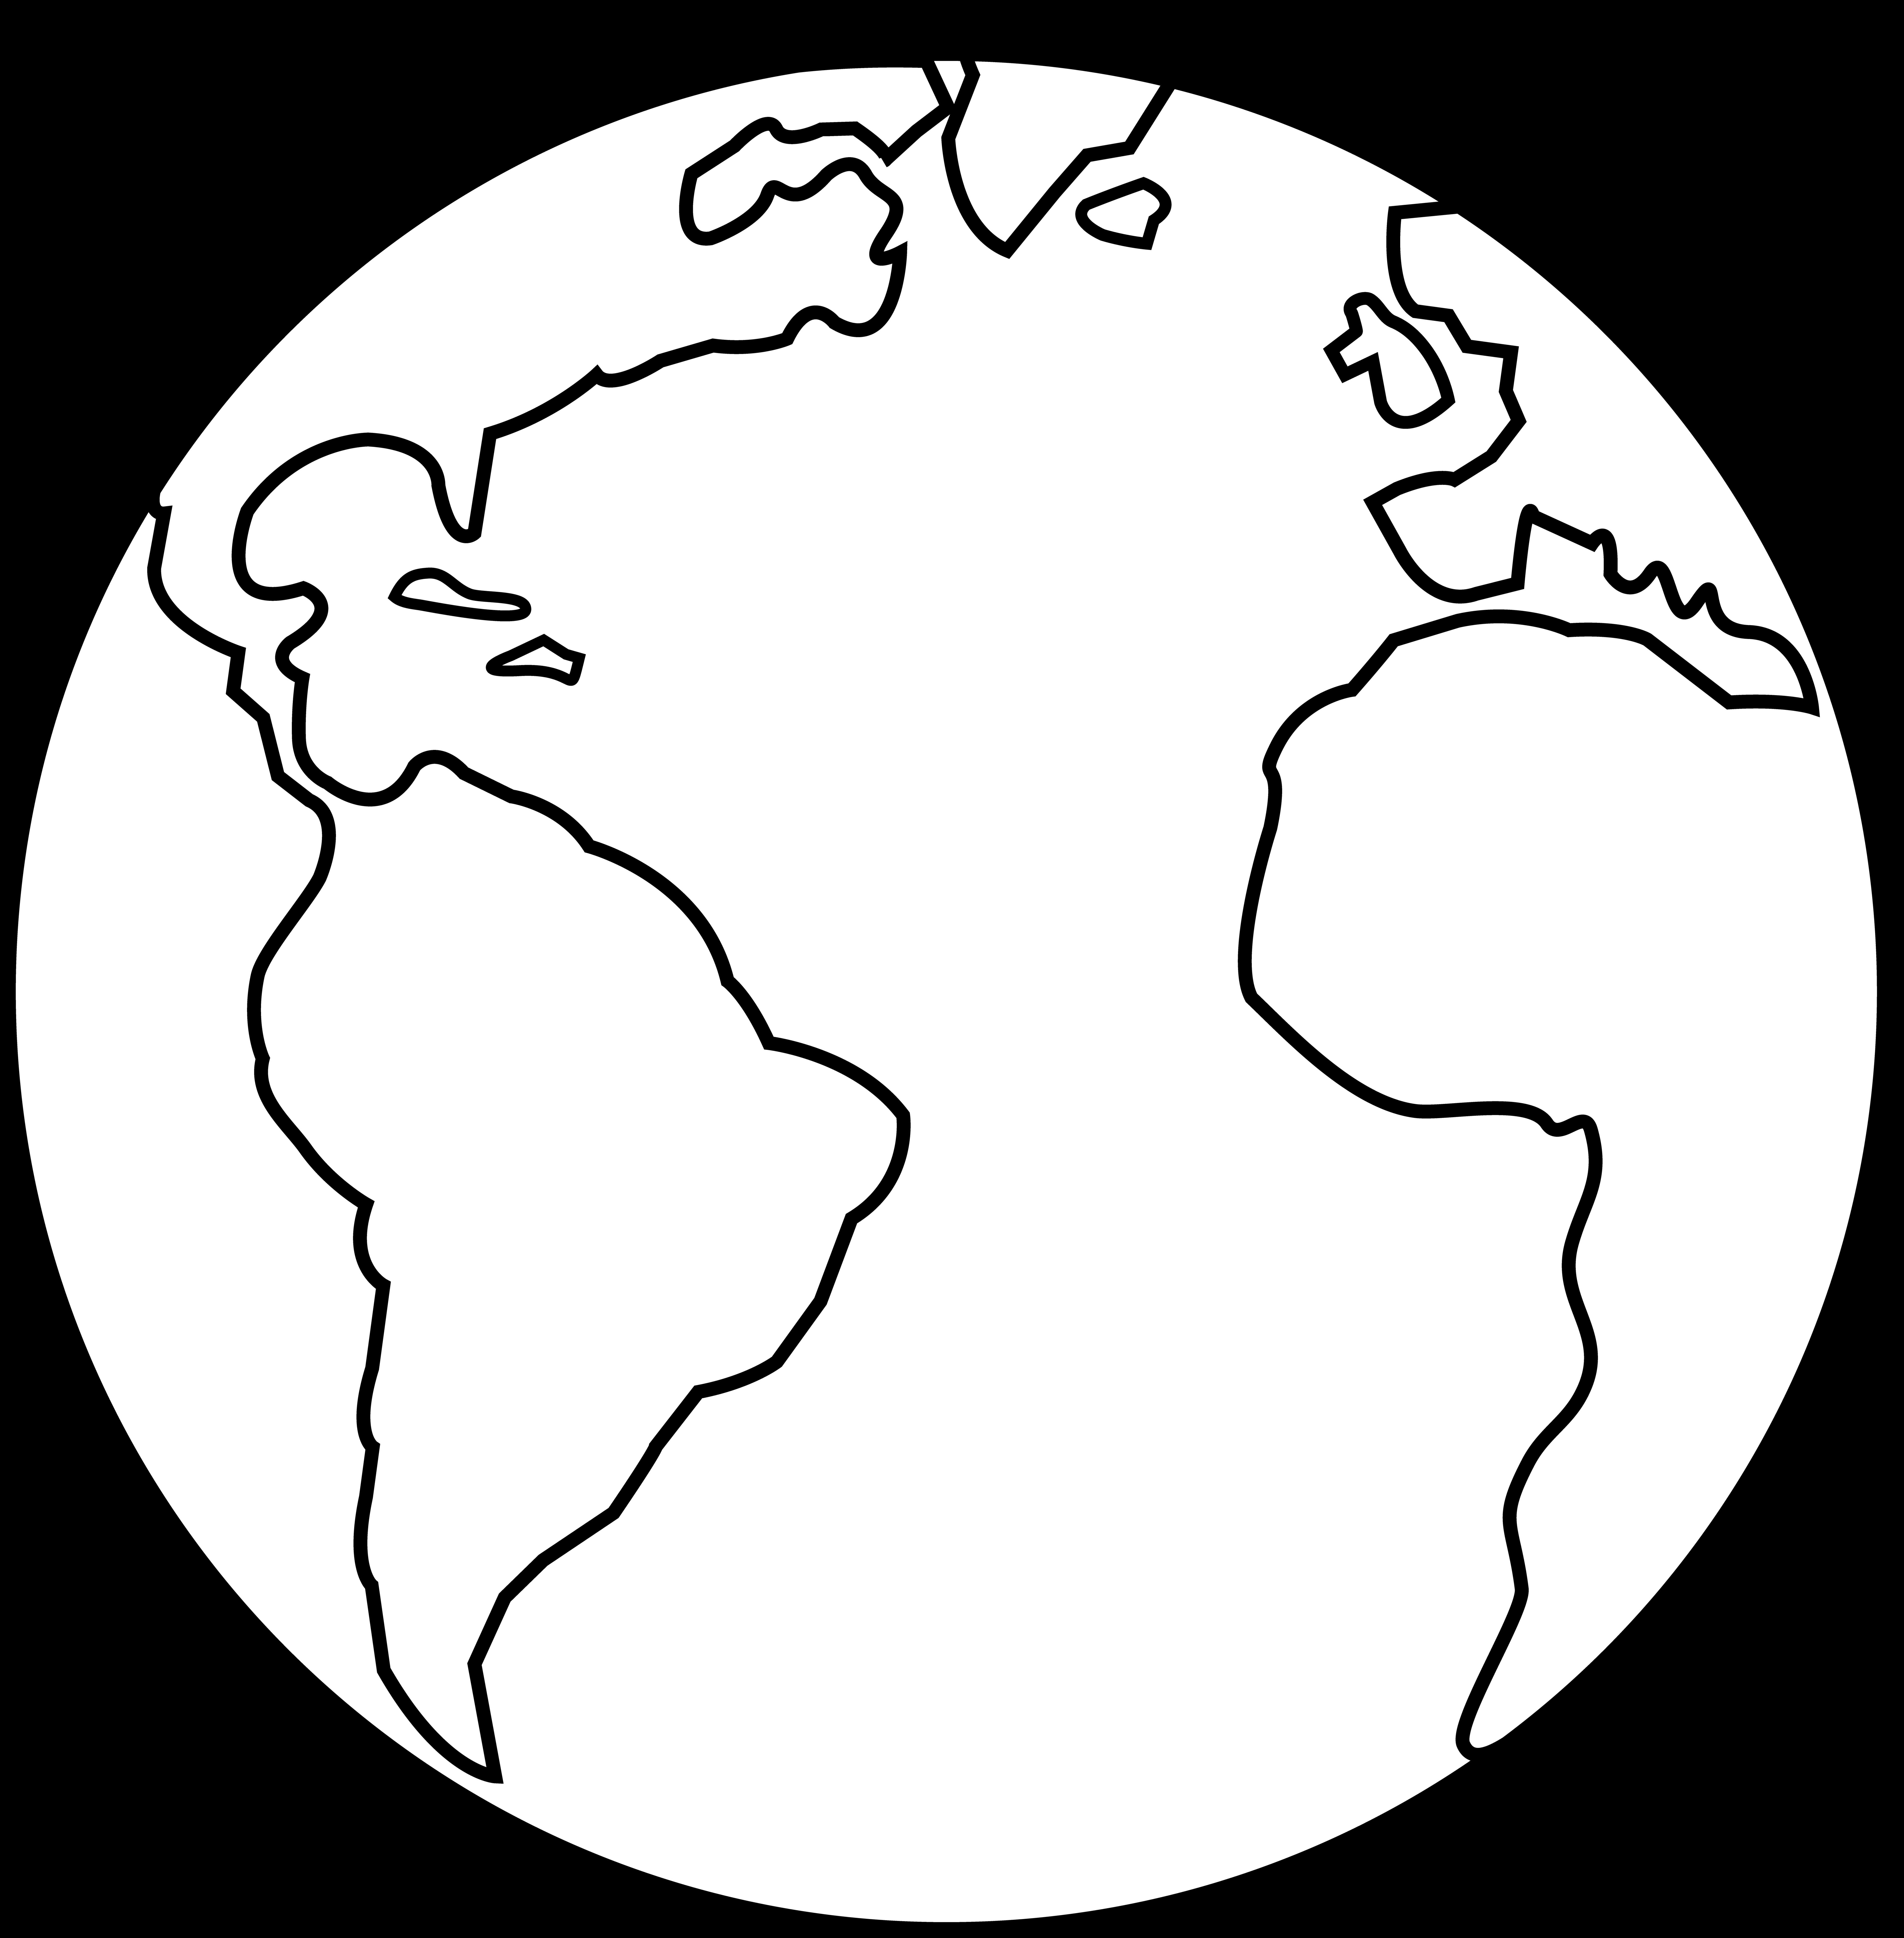 free Simple Globe Drawing at GetDrawings